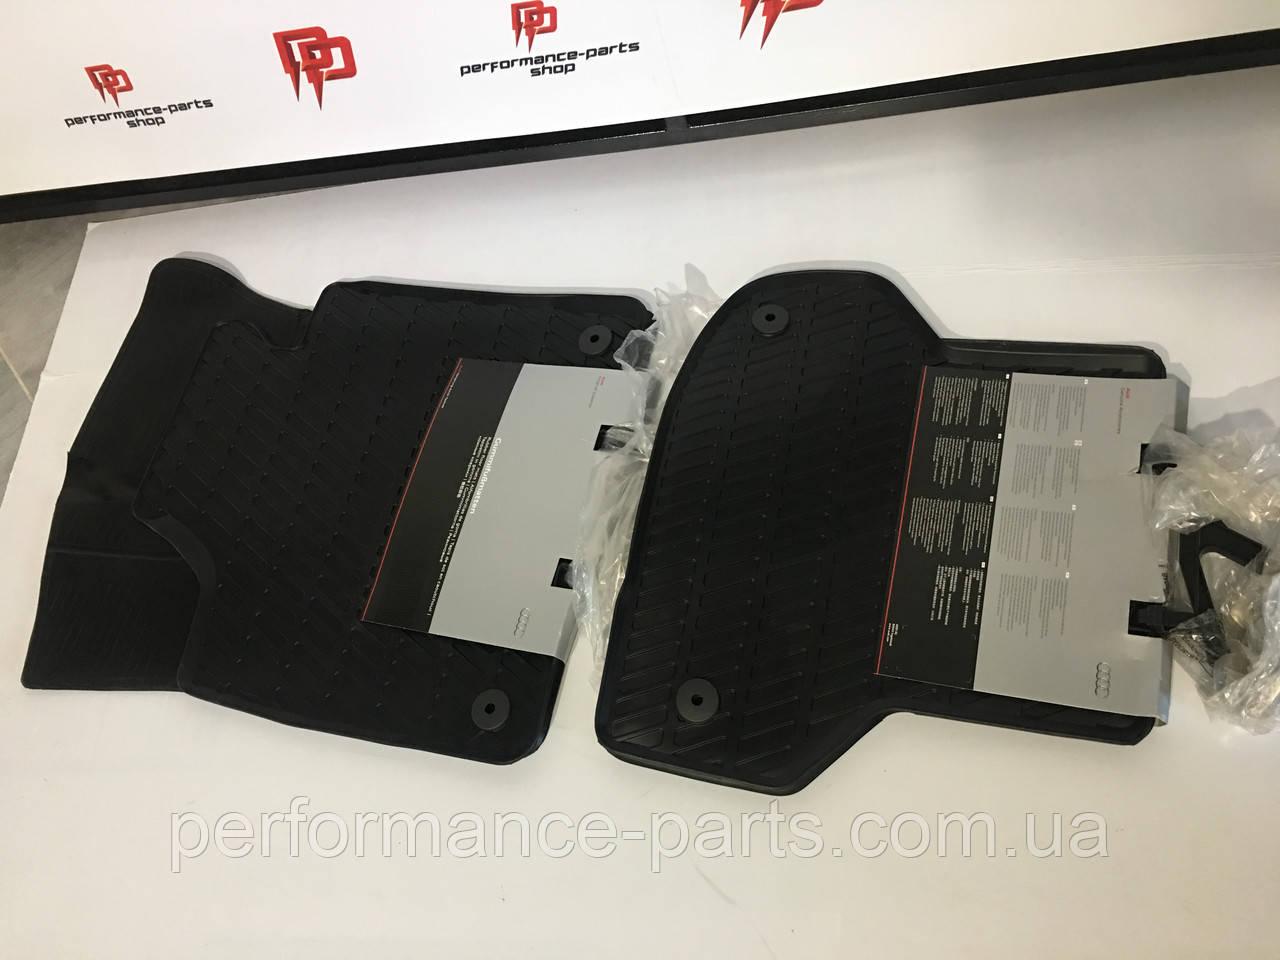 Коврики салона резиновые комплект Audi A3 2004-2013.Артикул 8P1061501041-8P0061511041. Оригинал.